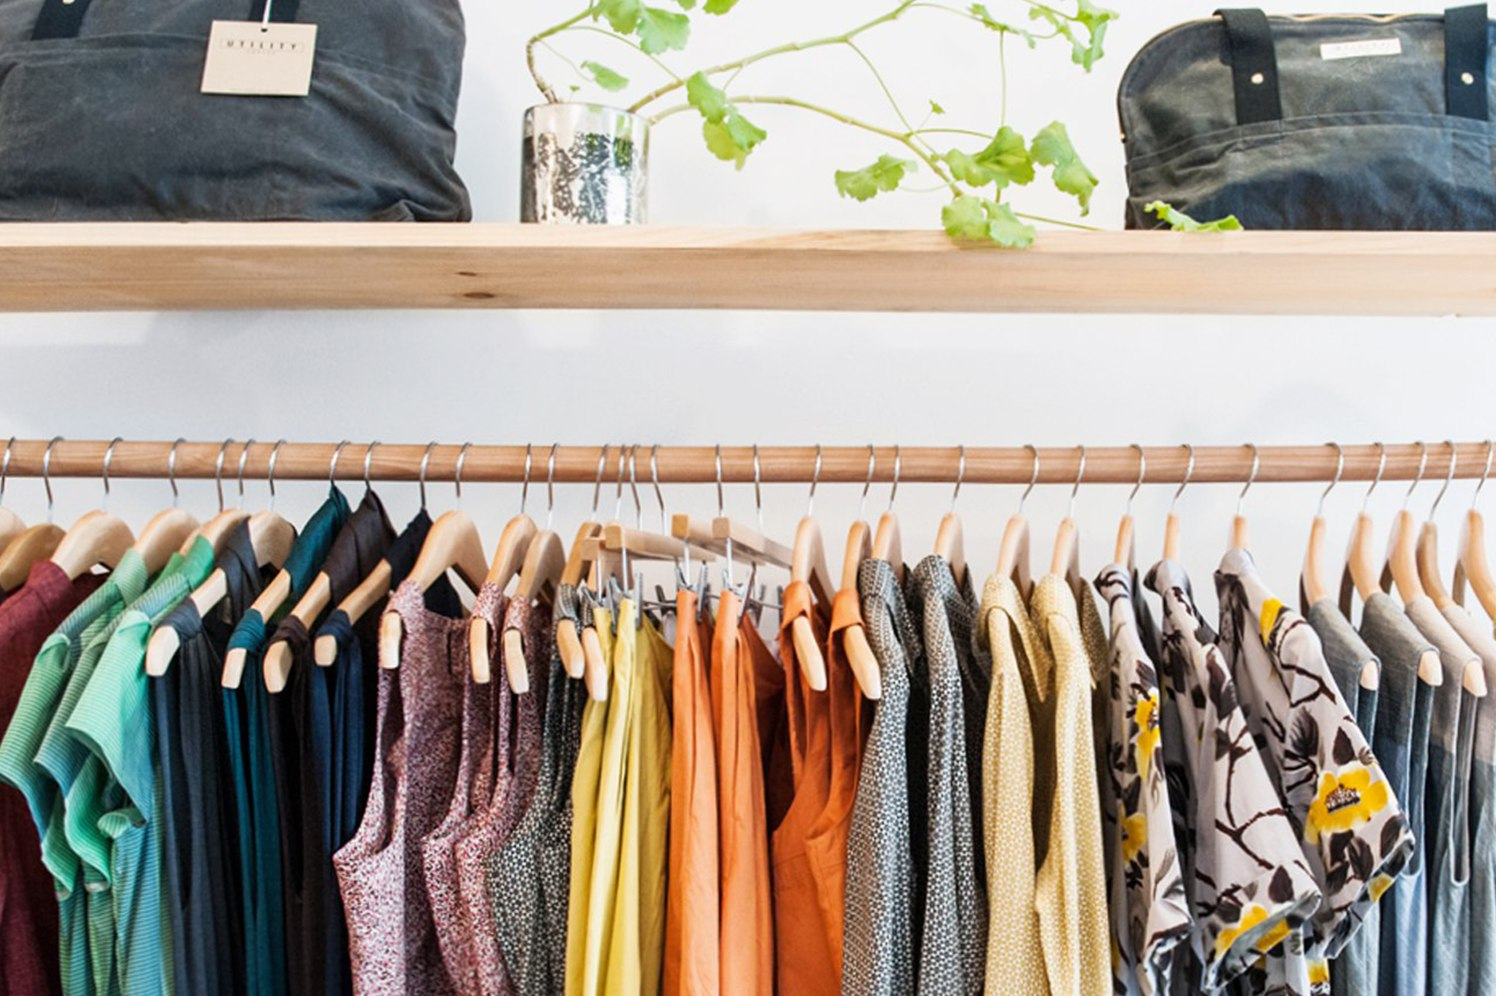 retail-inventory-management